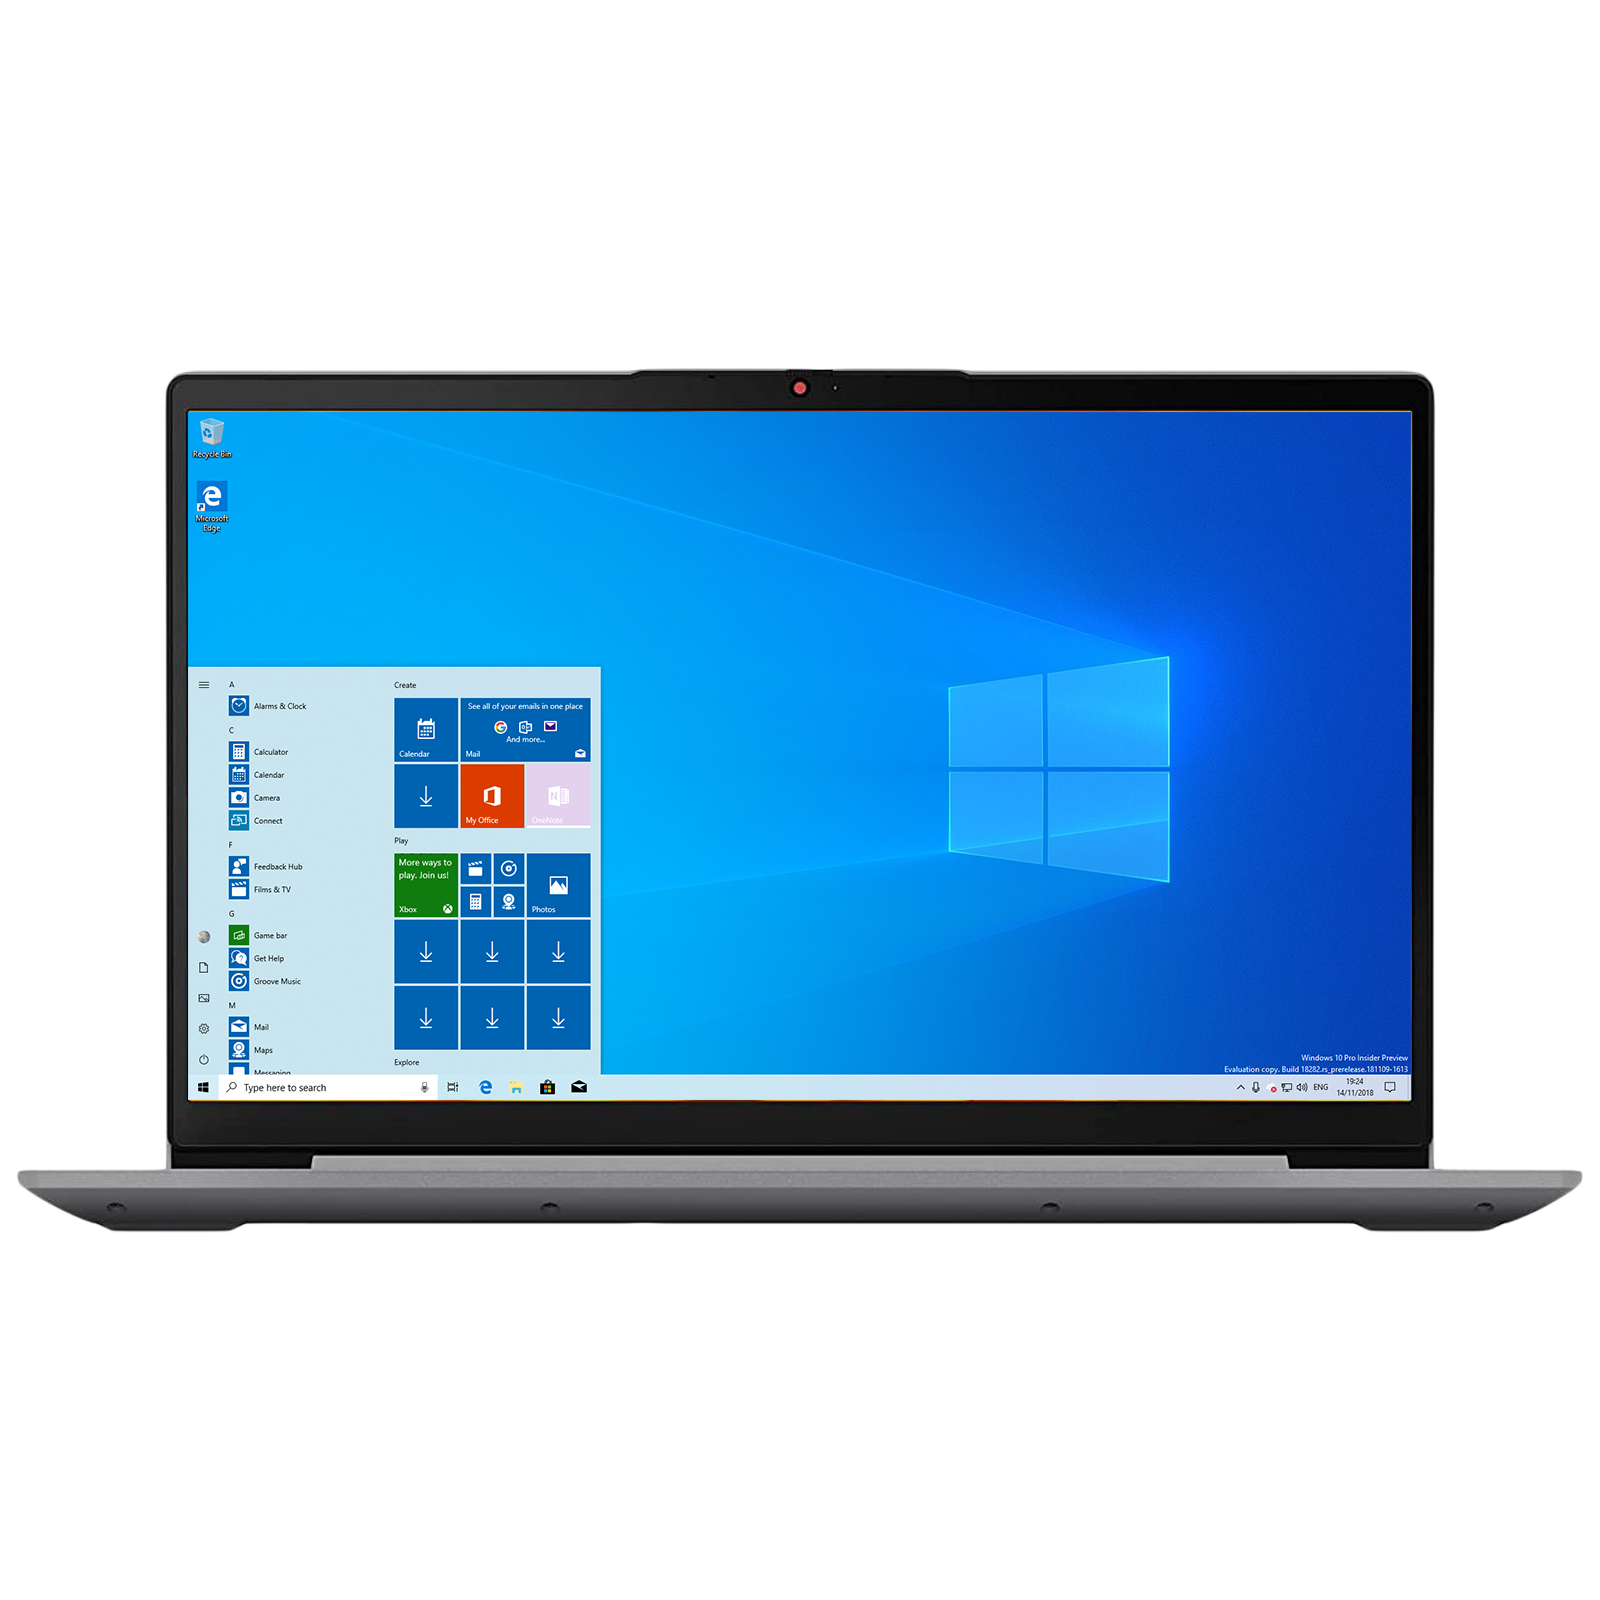 Lenovo IdeaPad 3 15ITL6 Core i3 11th Gen Windows 10 Home Thin and Light Laptop (8GB RAM, 512GB SSD, Intel UHD Graphics, MS Office, 39.62cm, 82H801G0IN, Arctic Grey)_1